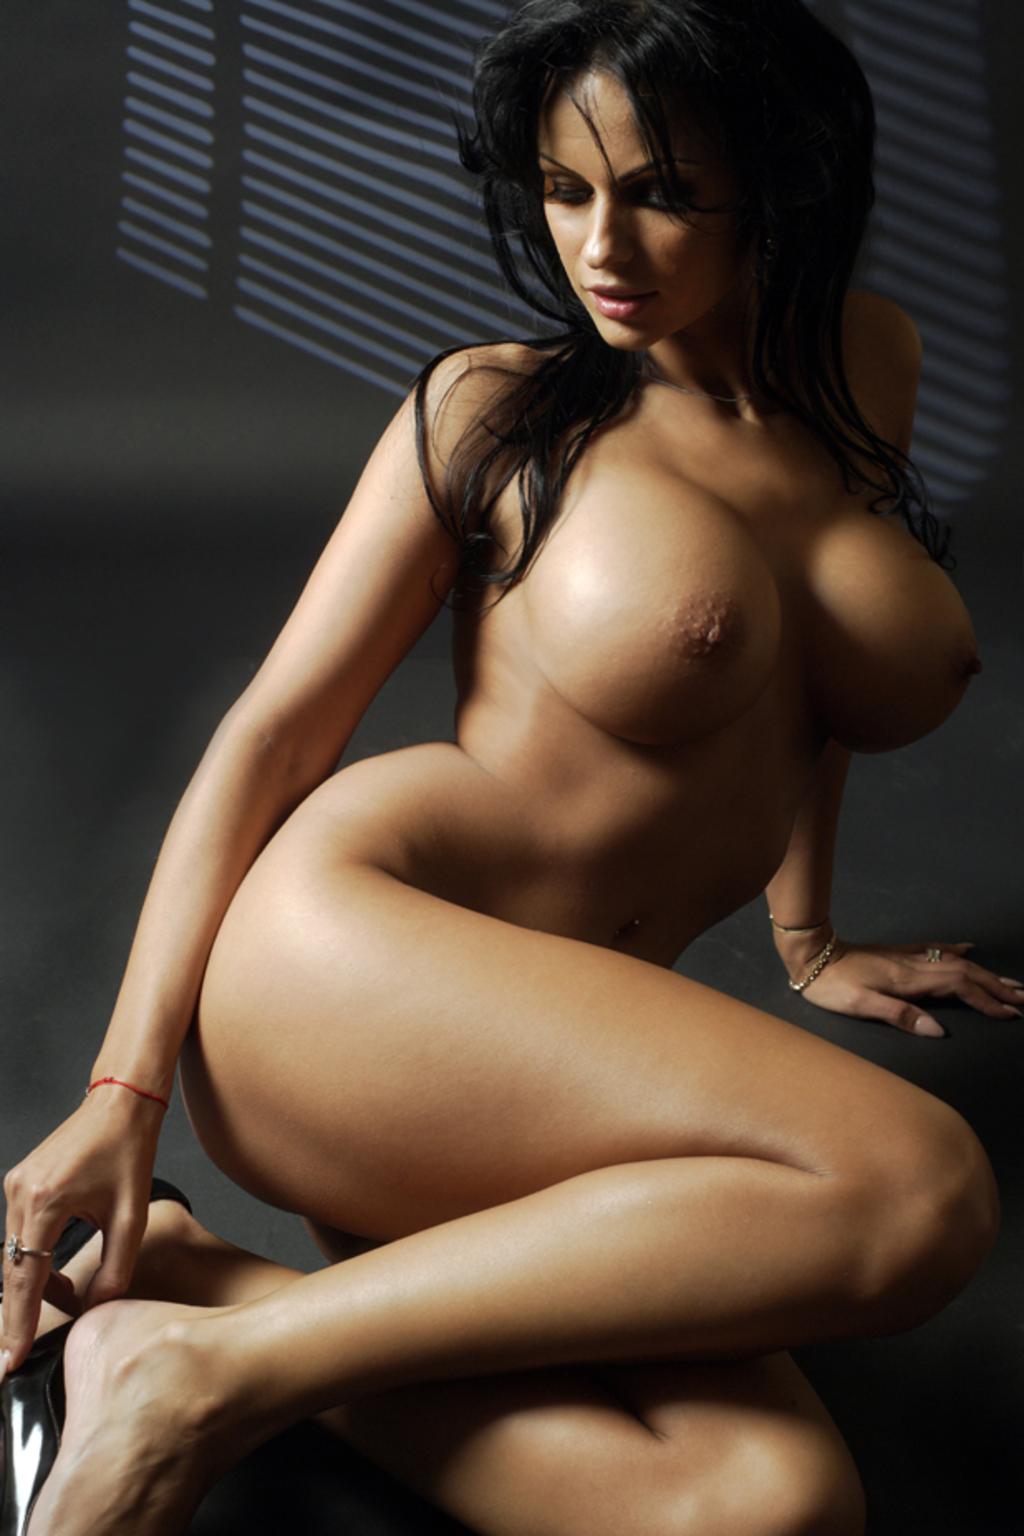 Секси девушка эро фото 9 фотография